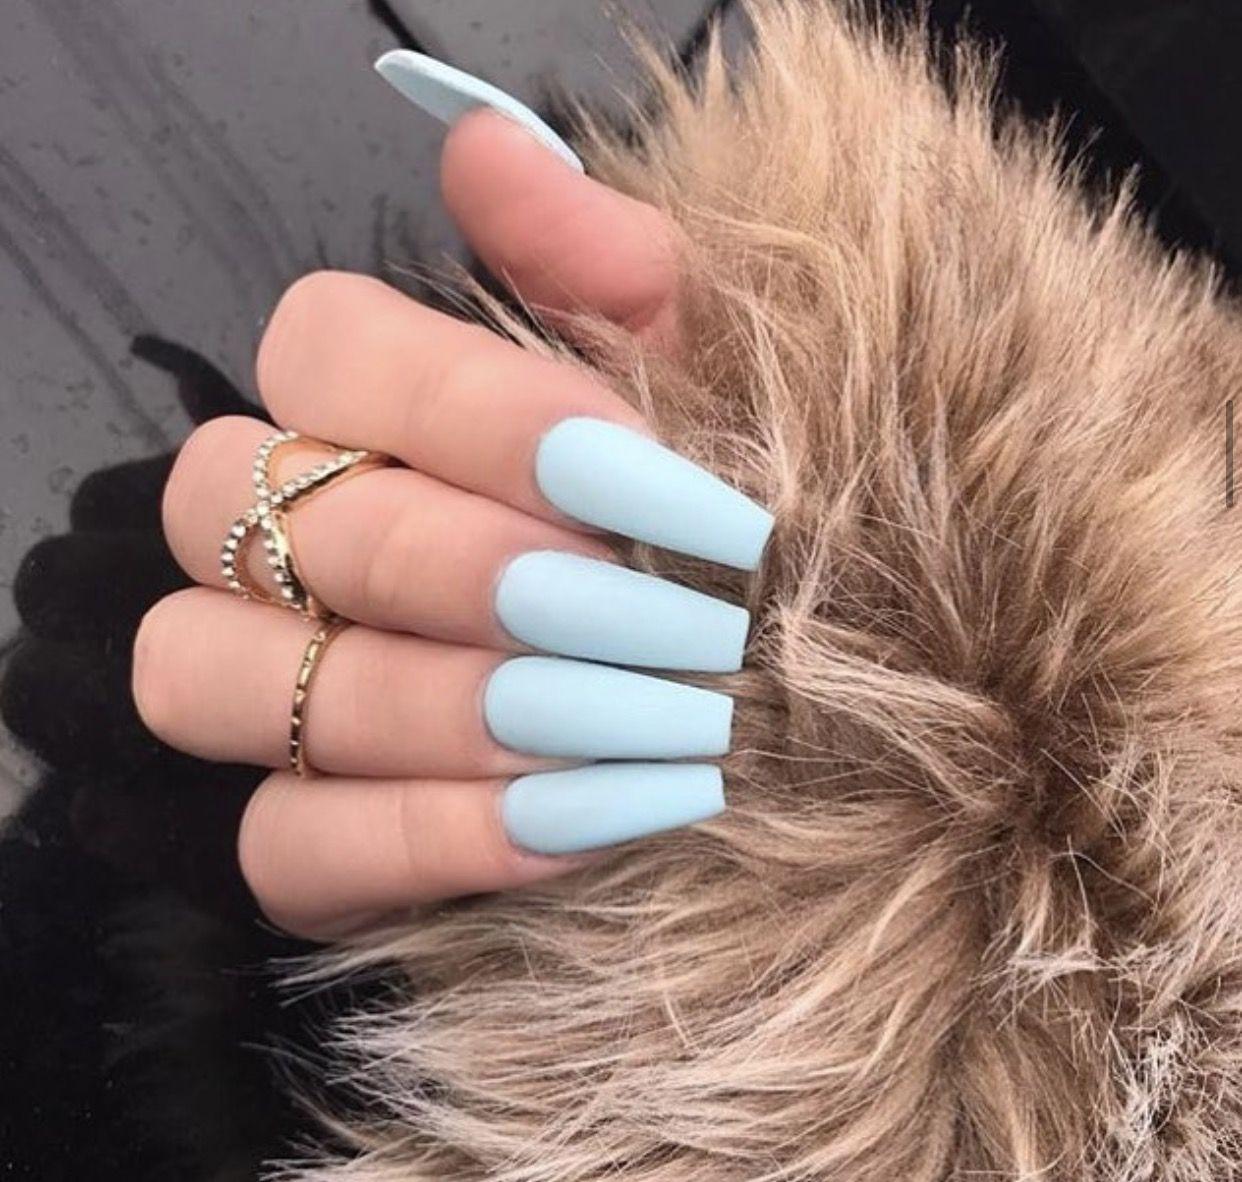 Baby Blue Acrylic Nails Baby Blue Acrylic Nails Blue Acrylic Nails Baby Blue Nails